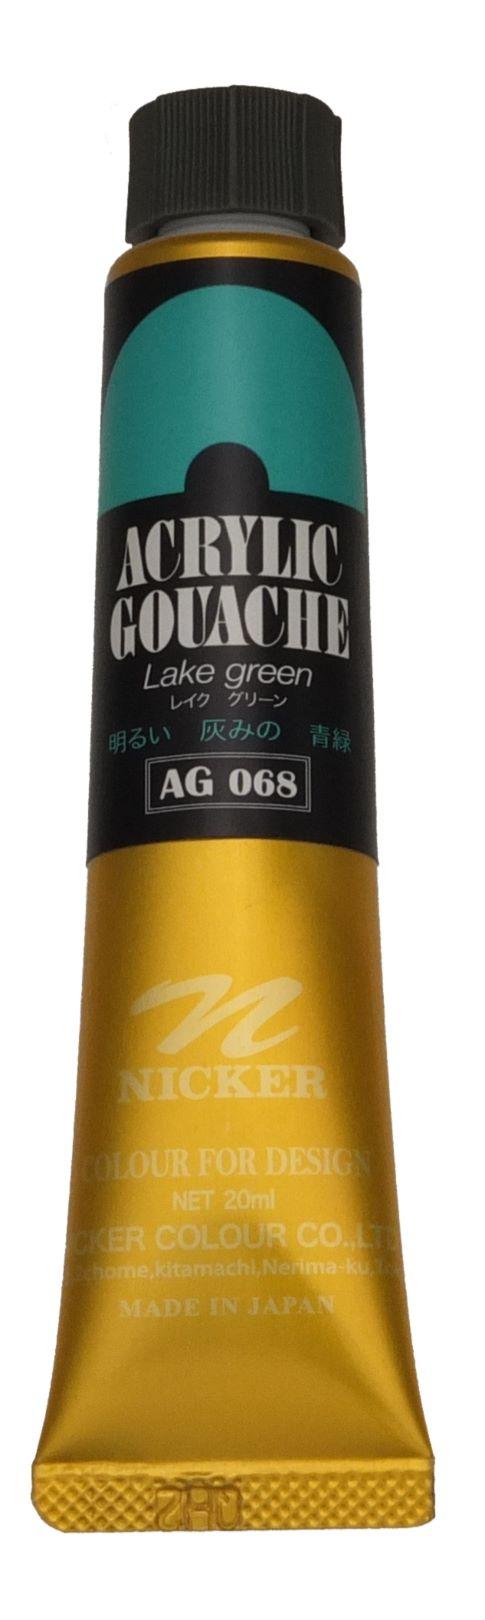 <Discontinued> ACRYLIC GOUACHE 20ml AG068 LAKE GREEN